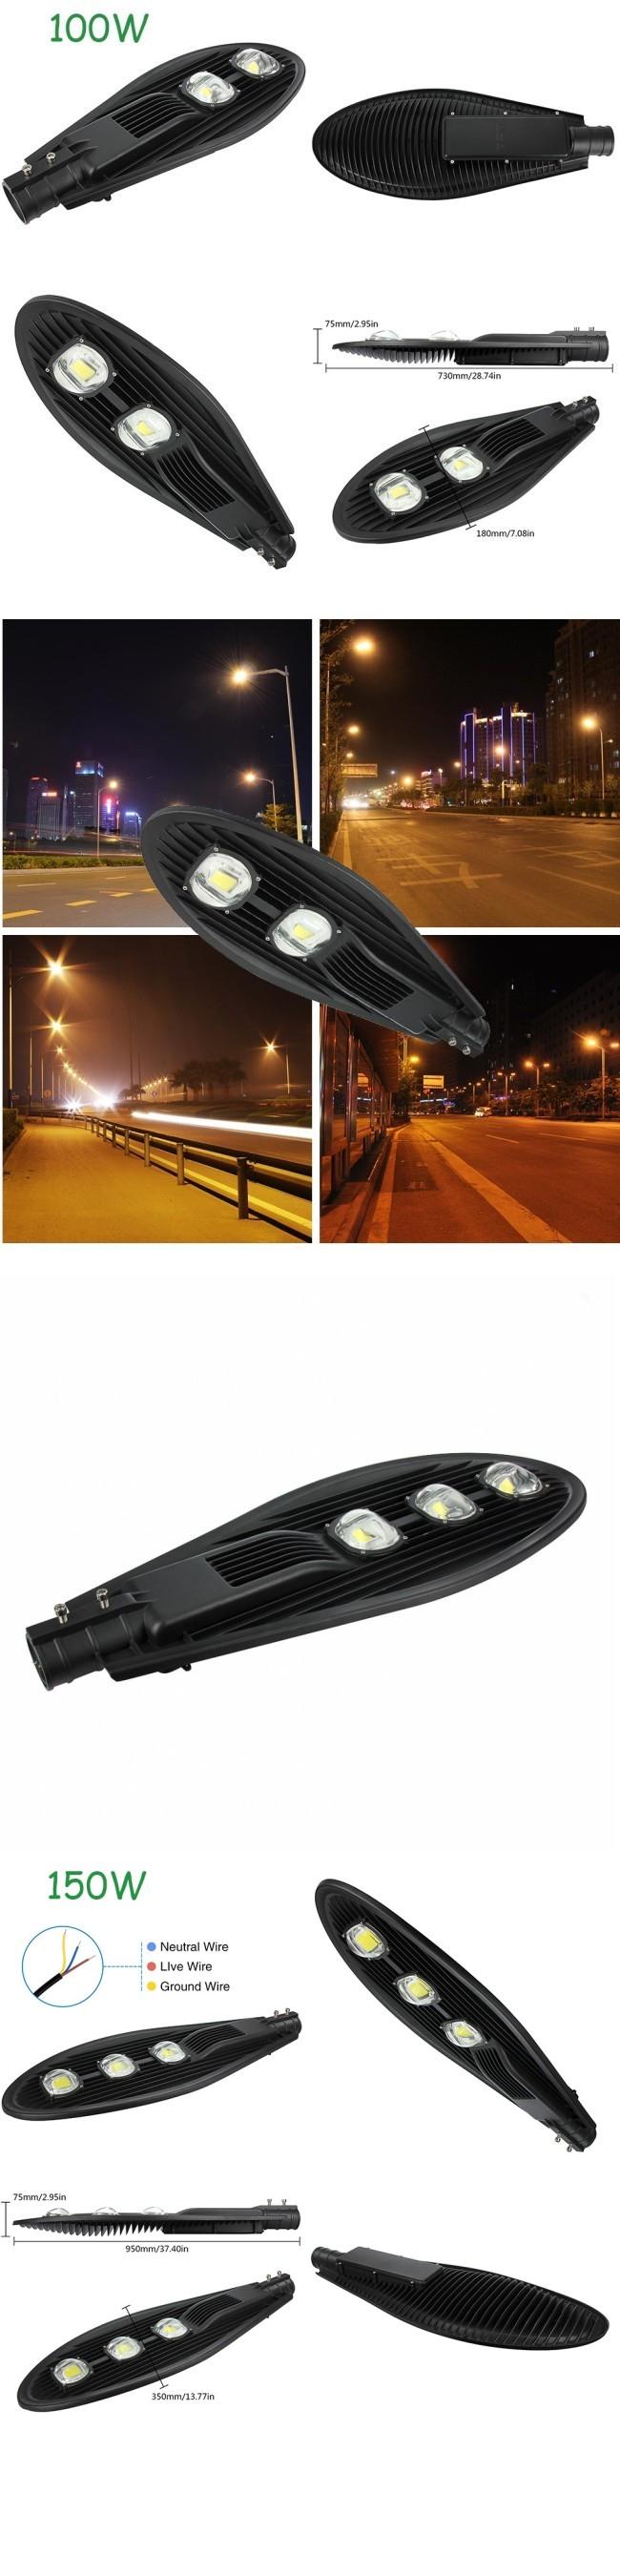 New Goods Professional Wholesale 80W LED Street Light Road Light Bridgelux 45mil